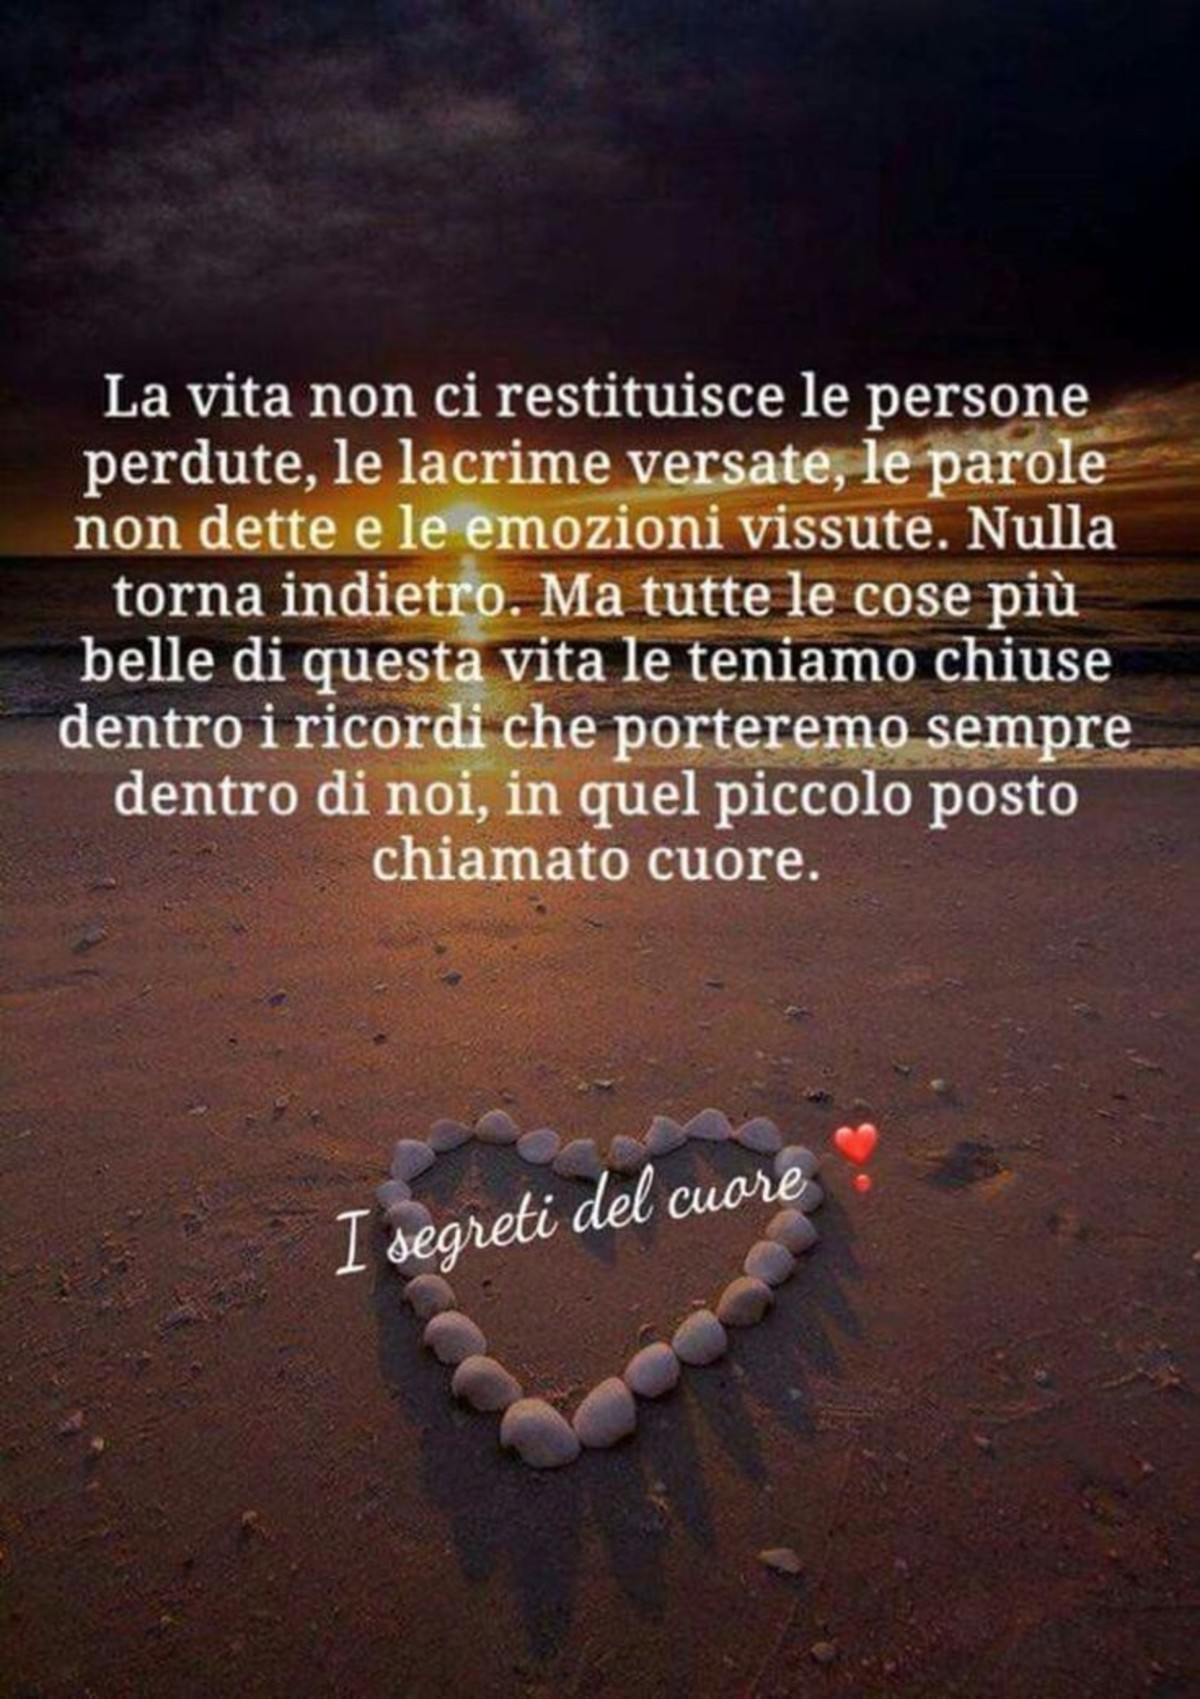 Belle Frasi Sull Amore 2 Buongiornoate It